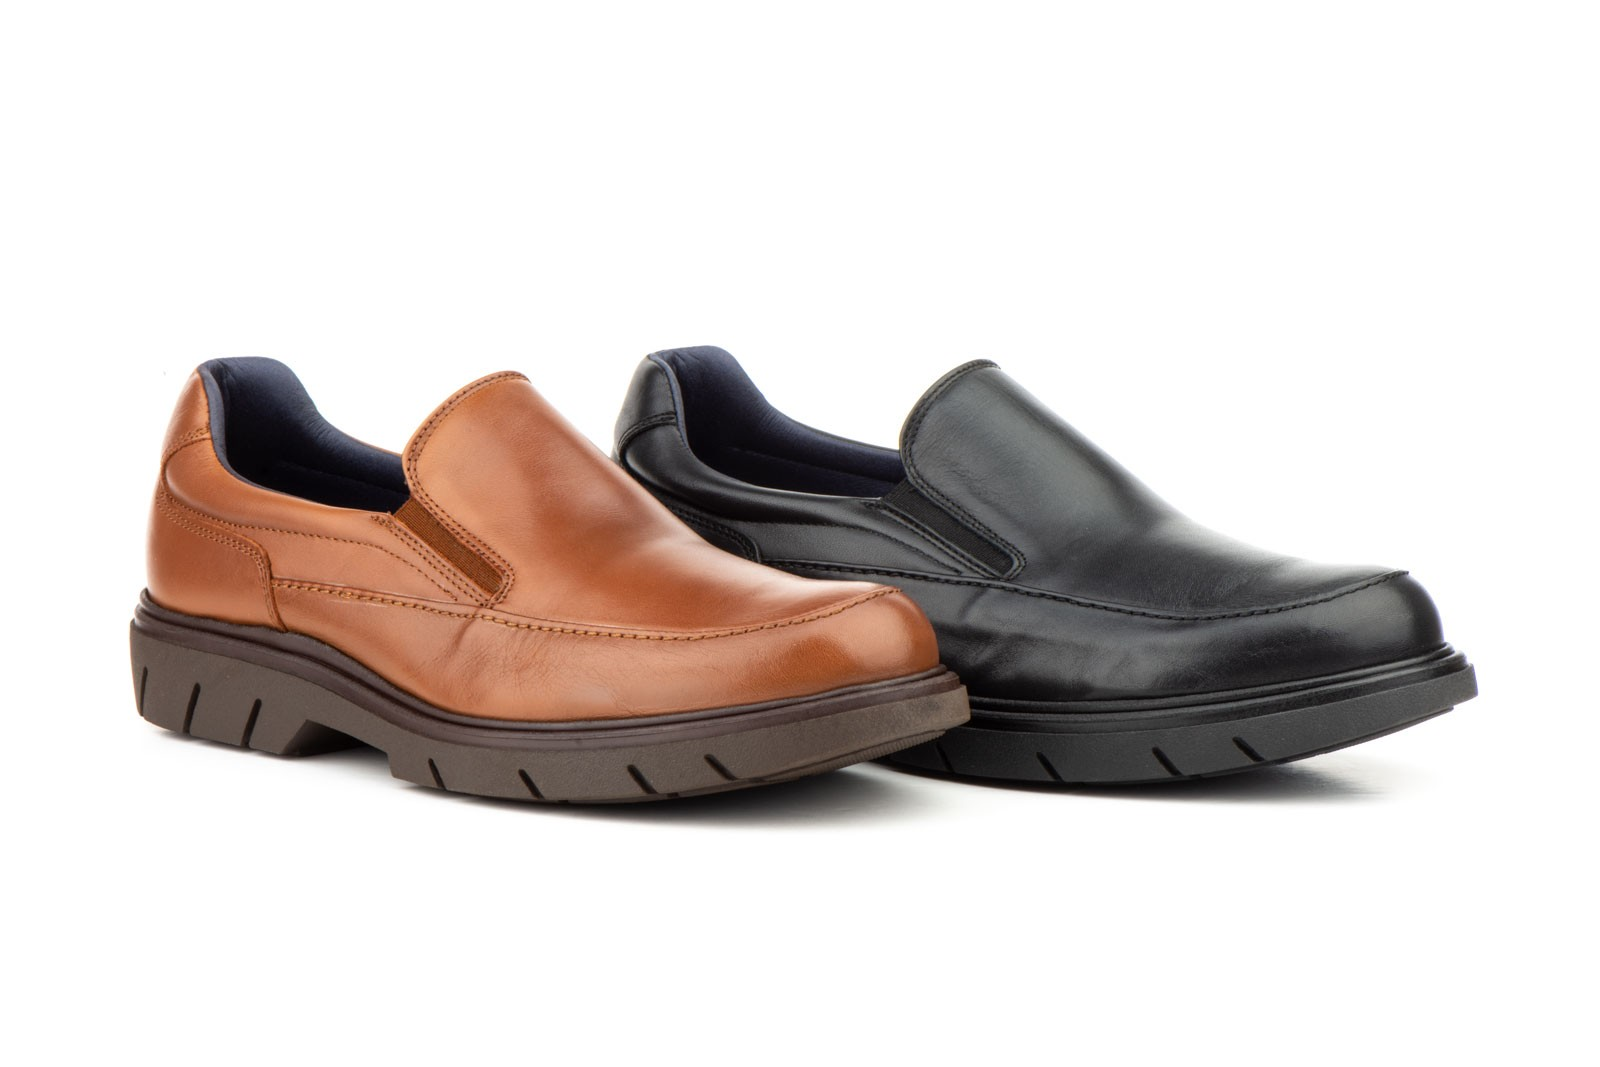 Zapatos Hombre Moacasín Piel Elásticos KL-388059,50€